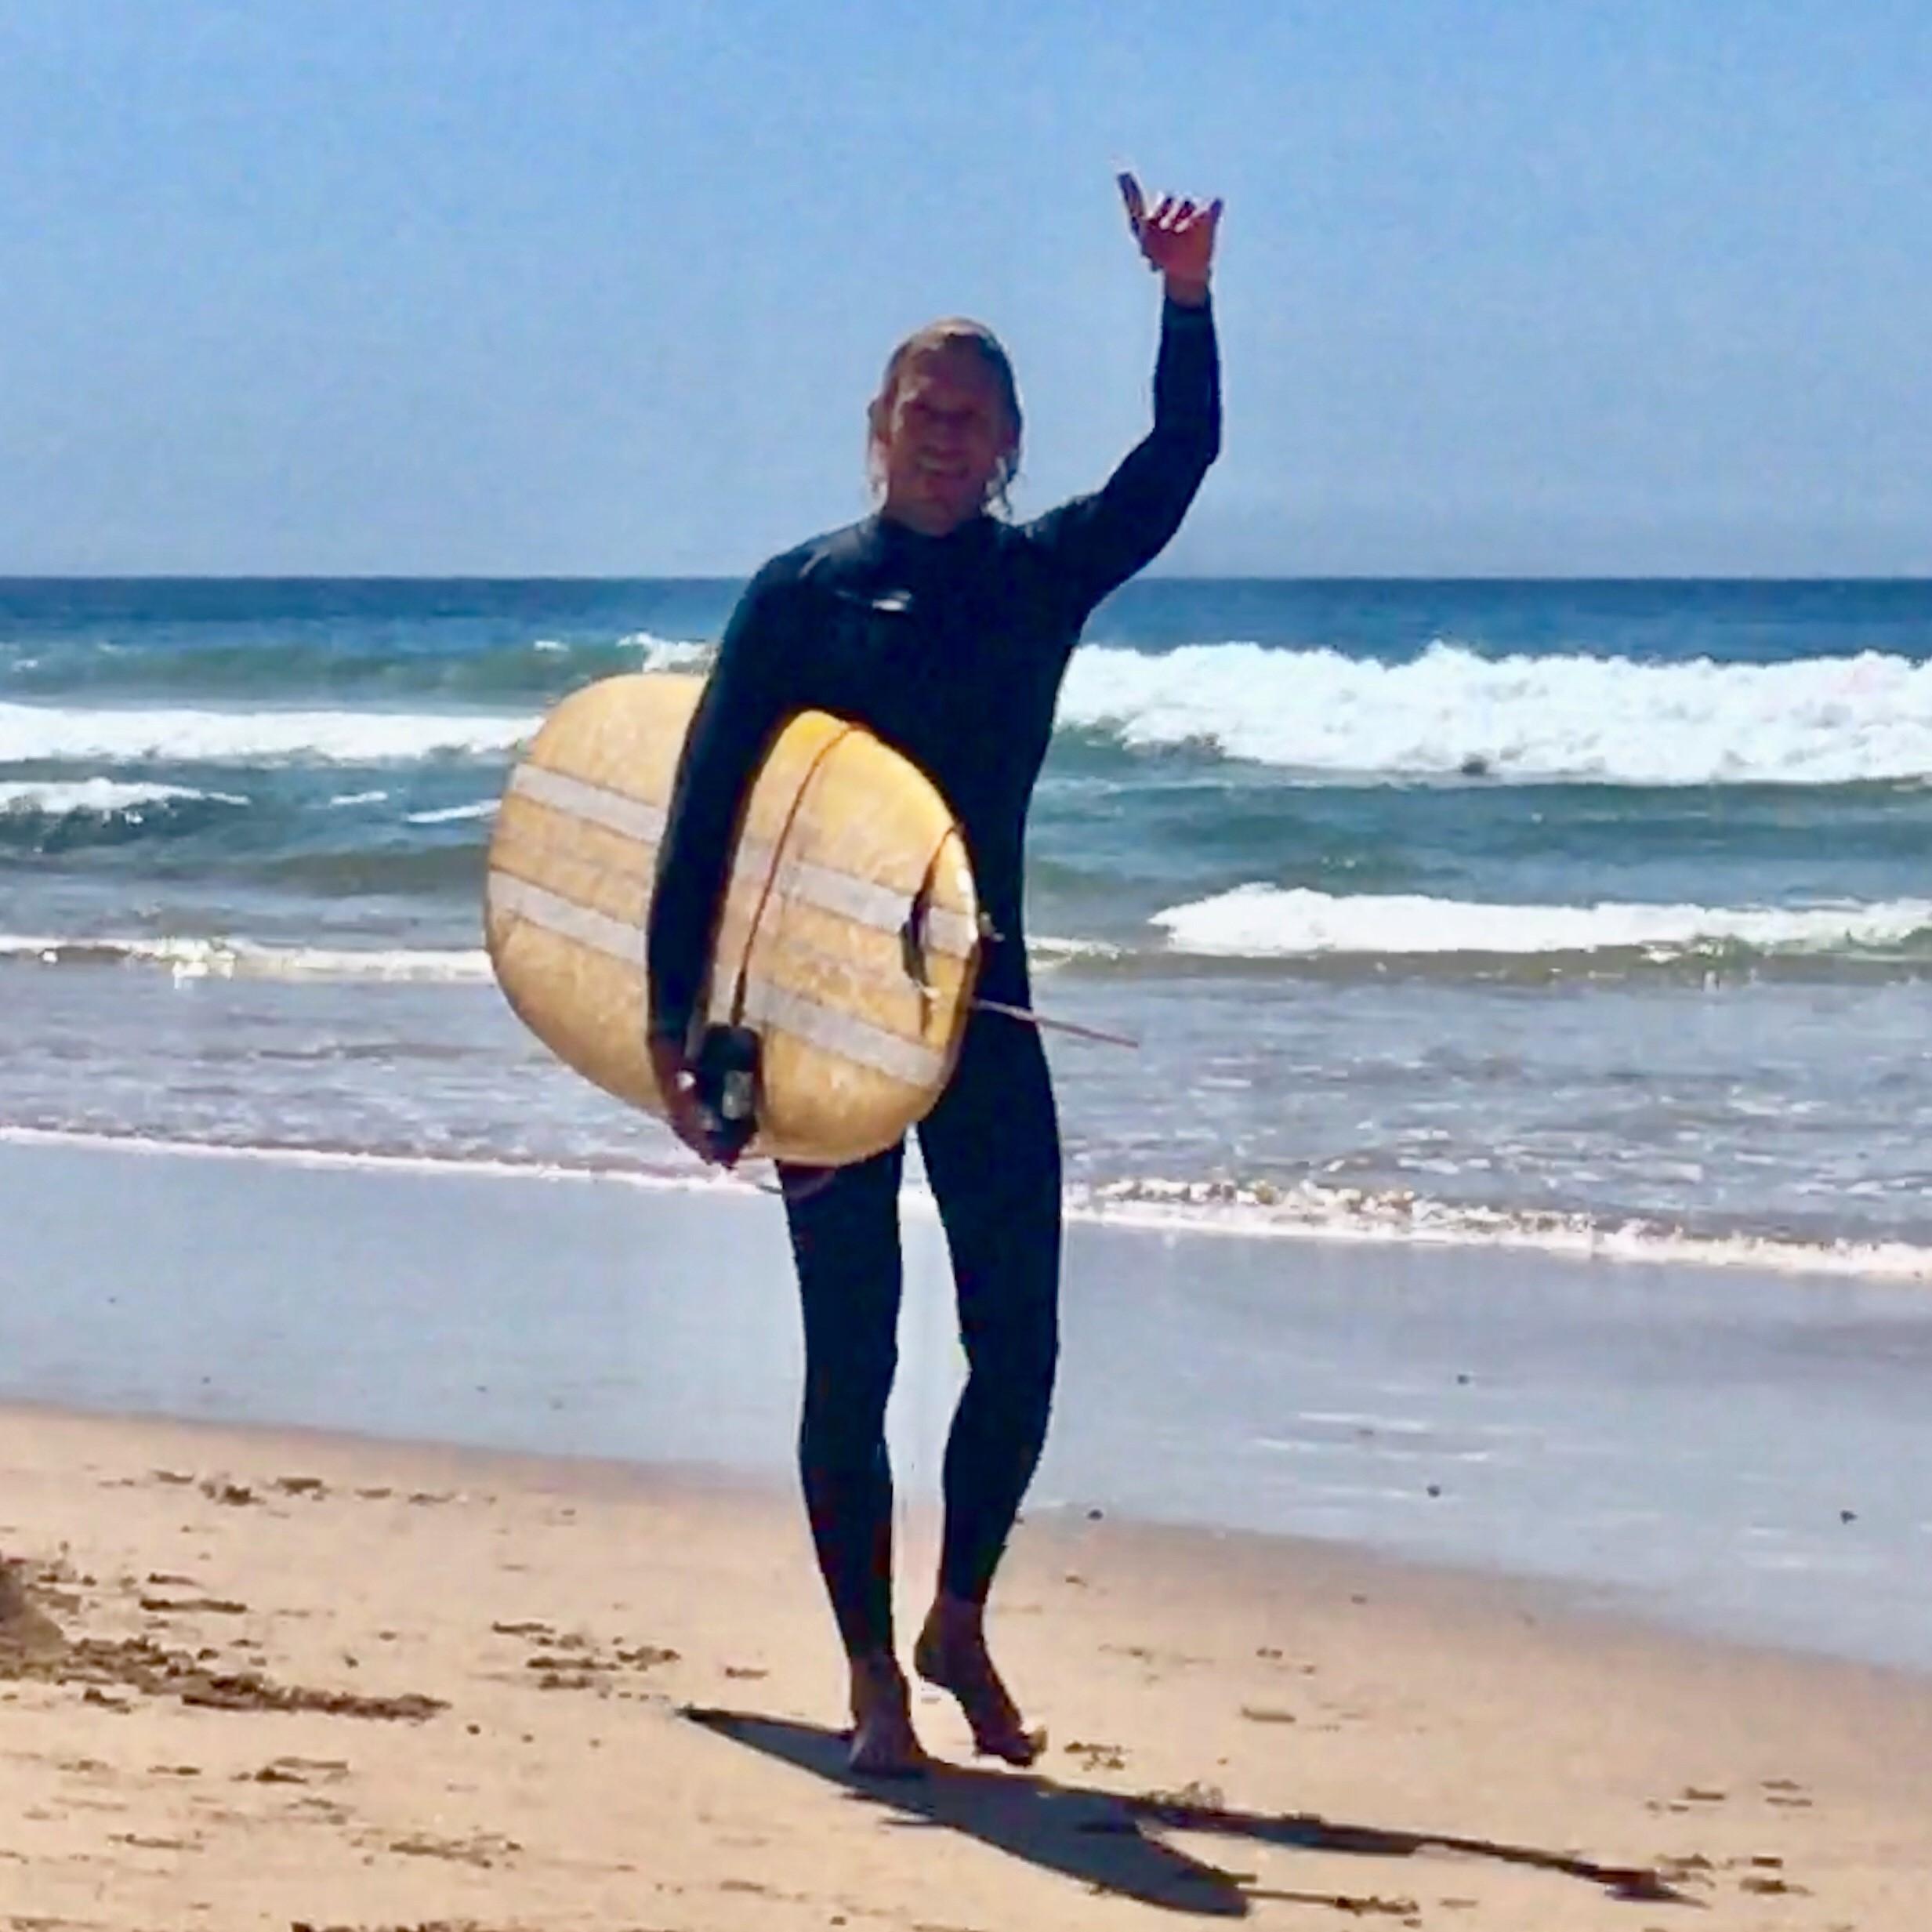 zavial surf buddy